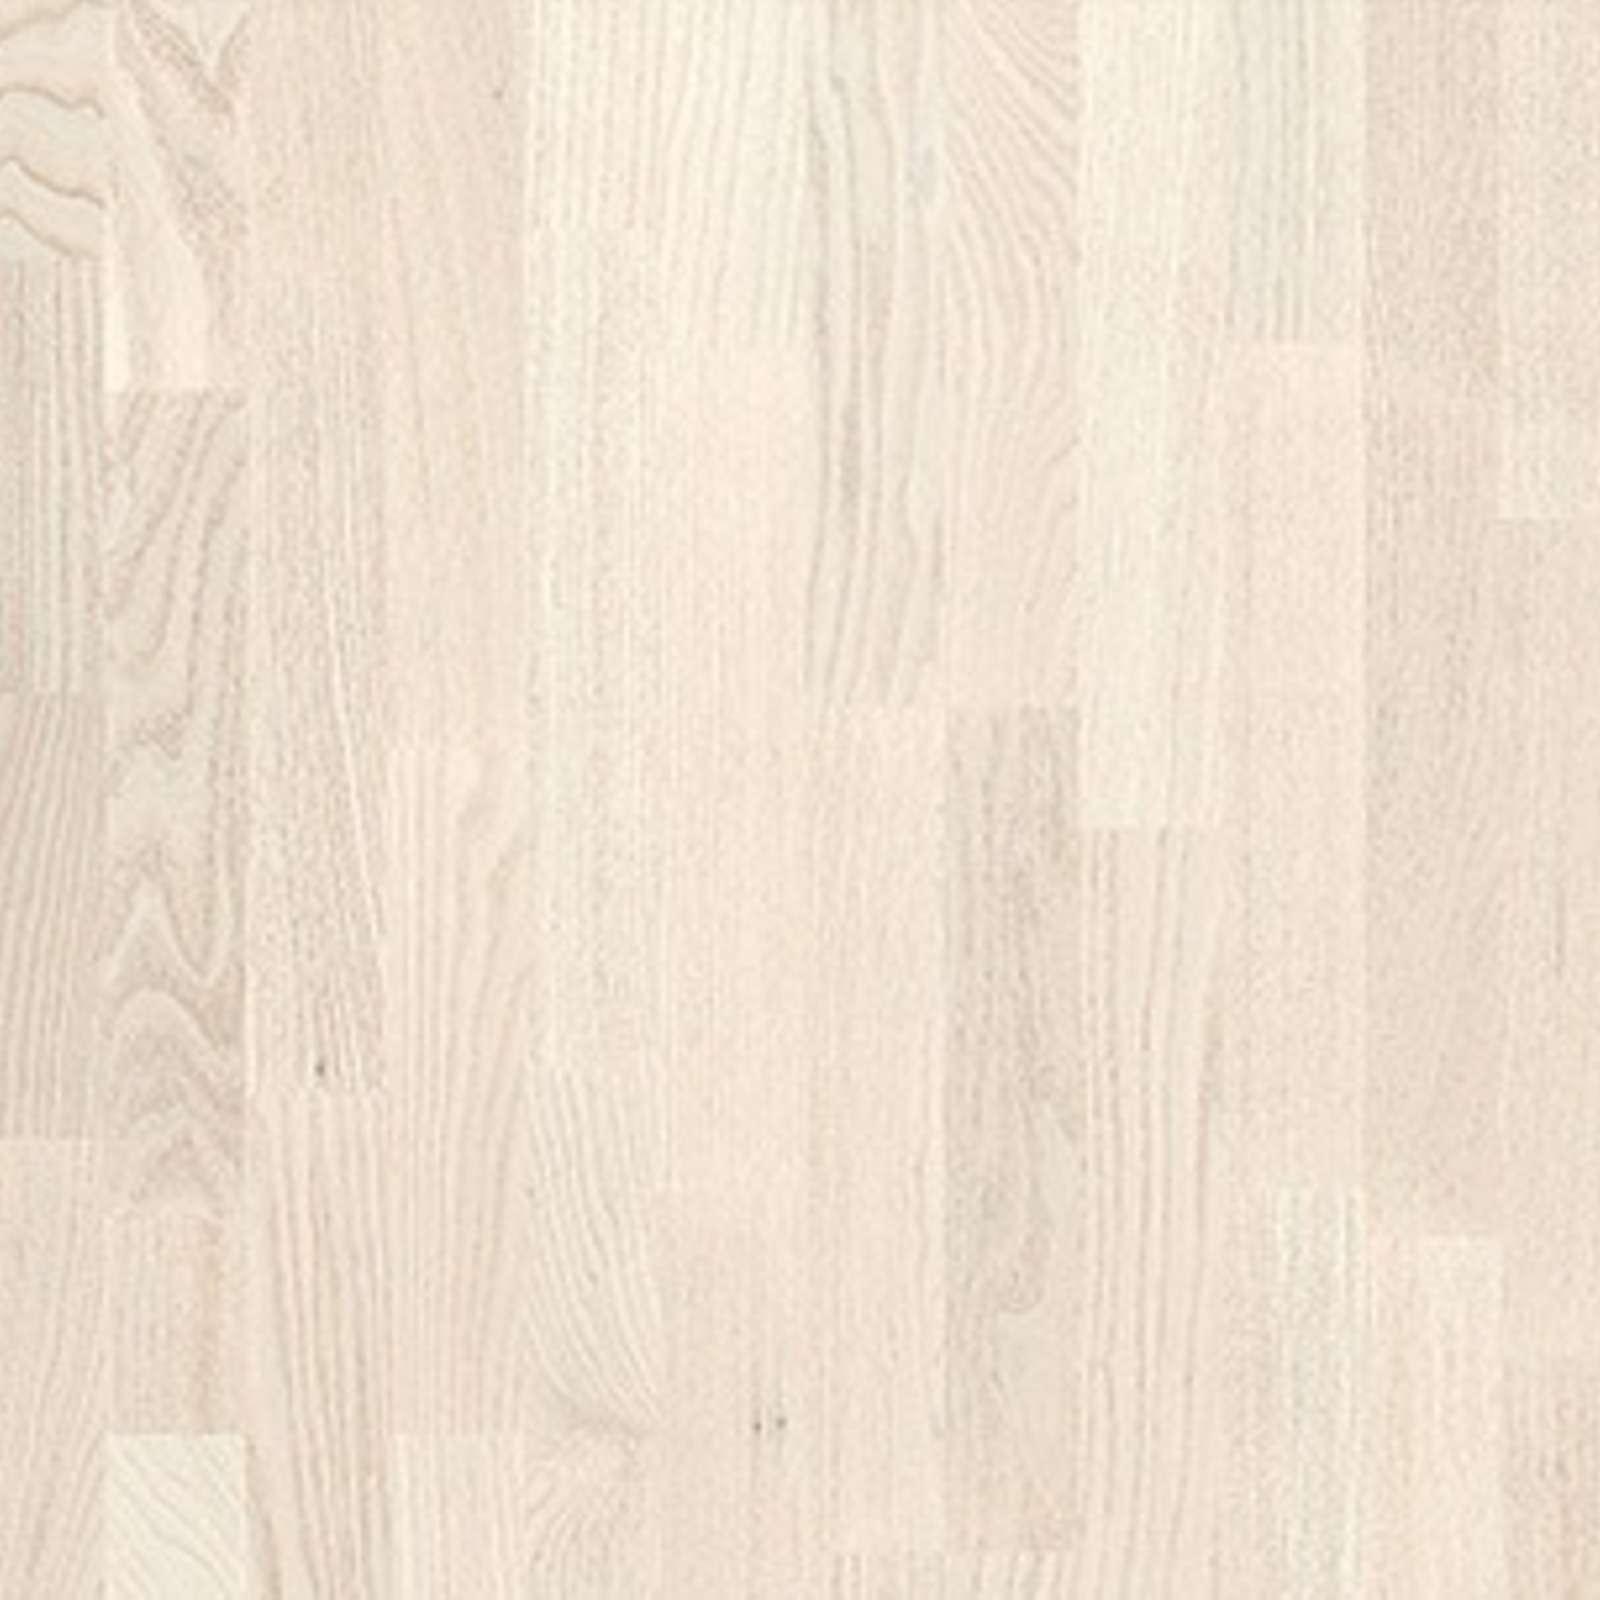 Паркет Tarkett Salsa ART White Pearl, 550050015, 2283х194х14 мм, (2.658м2/6шт)